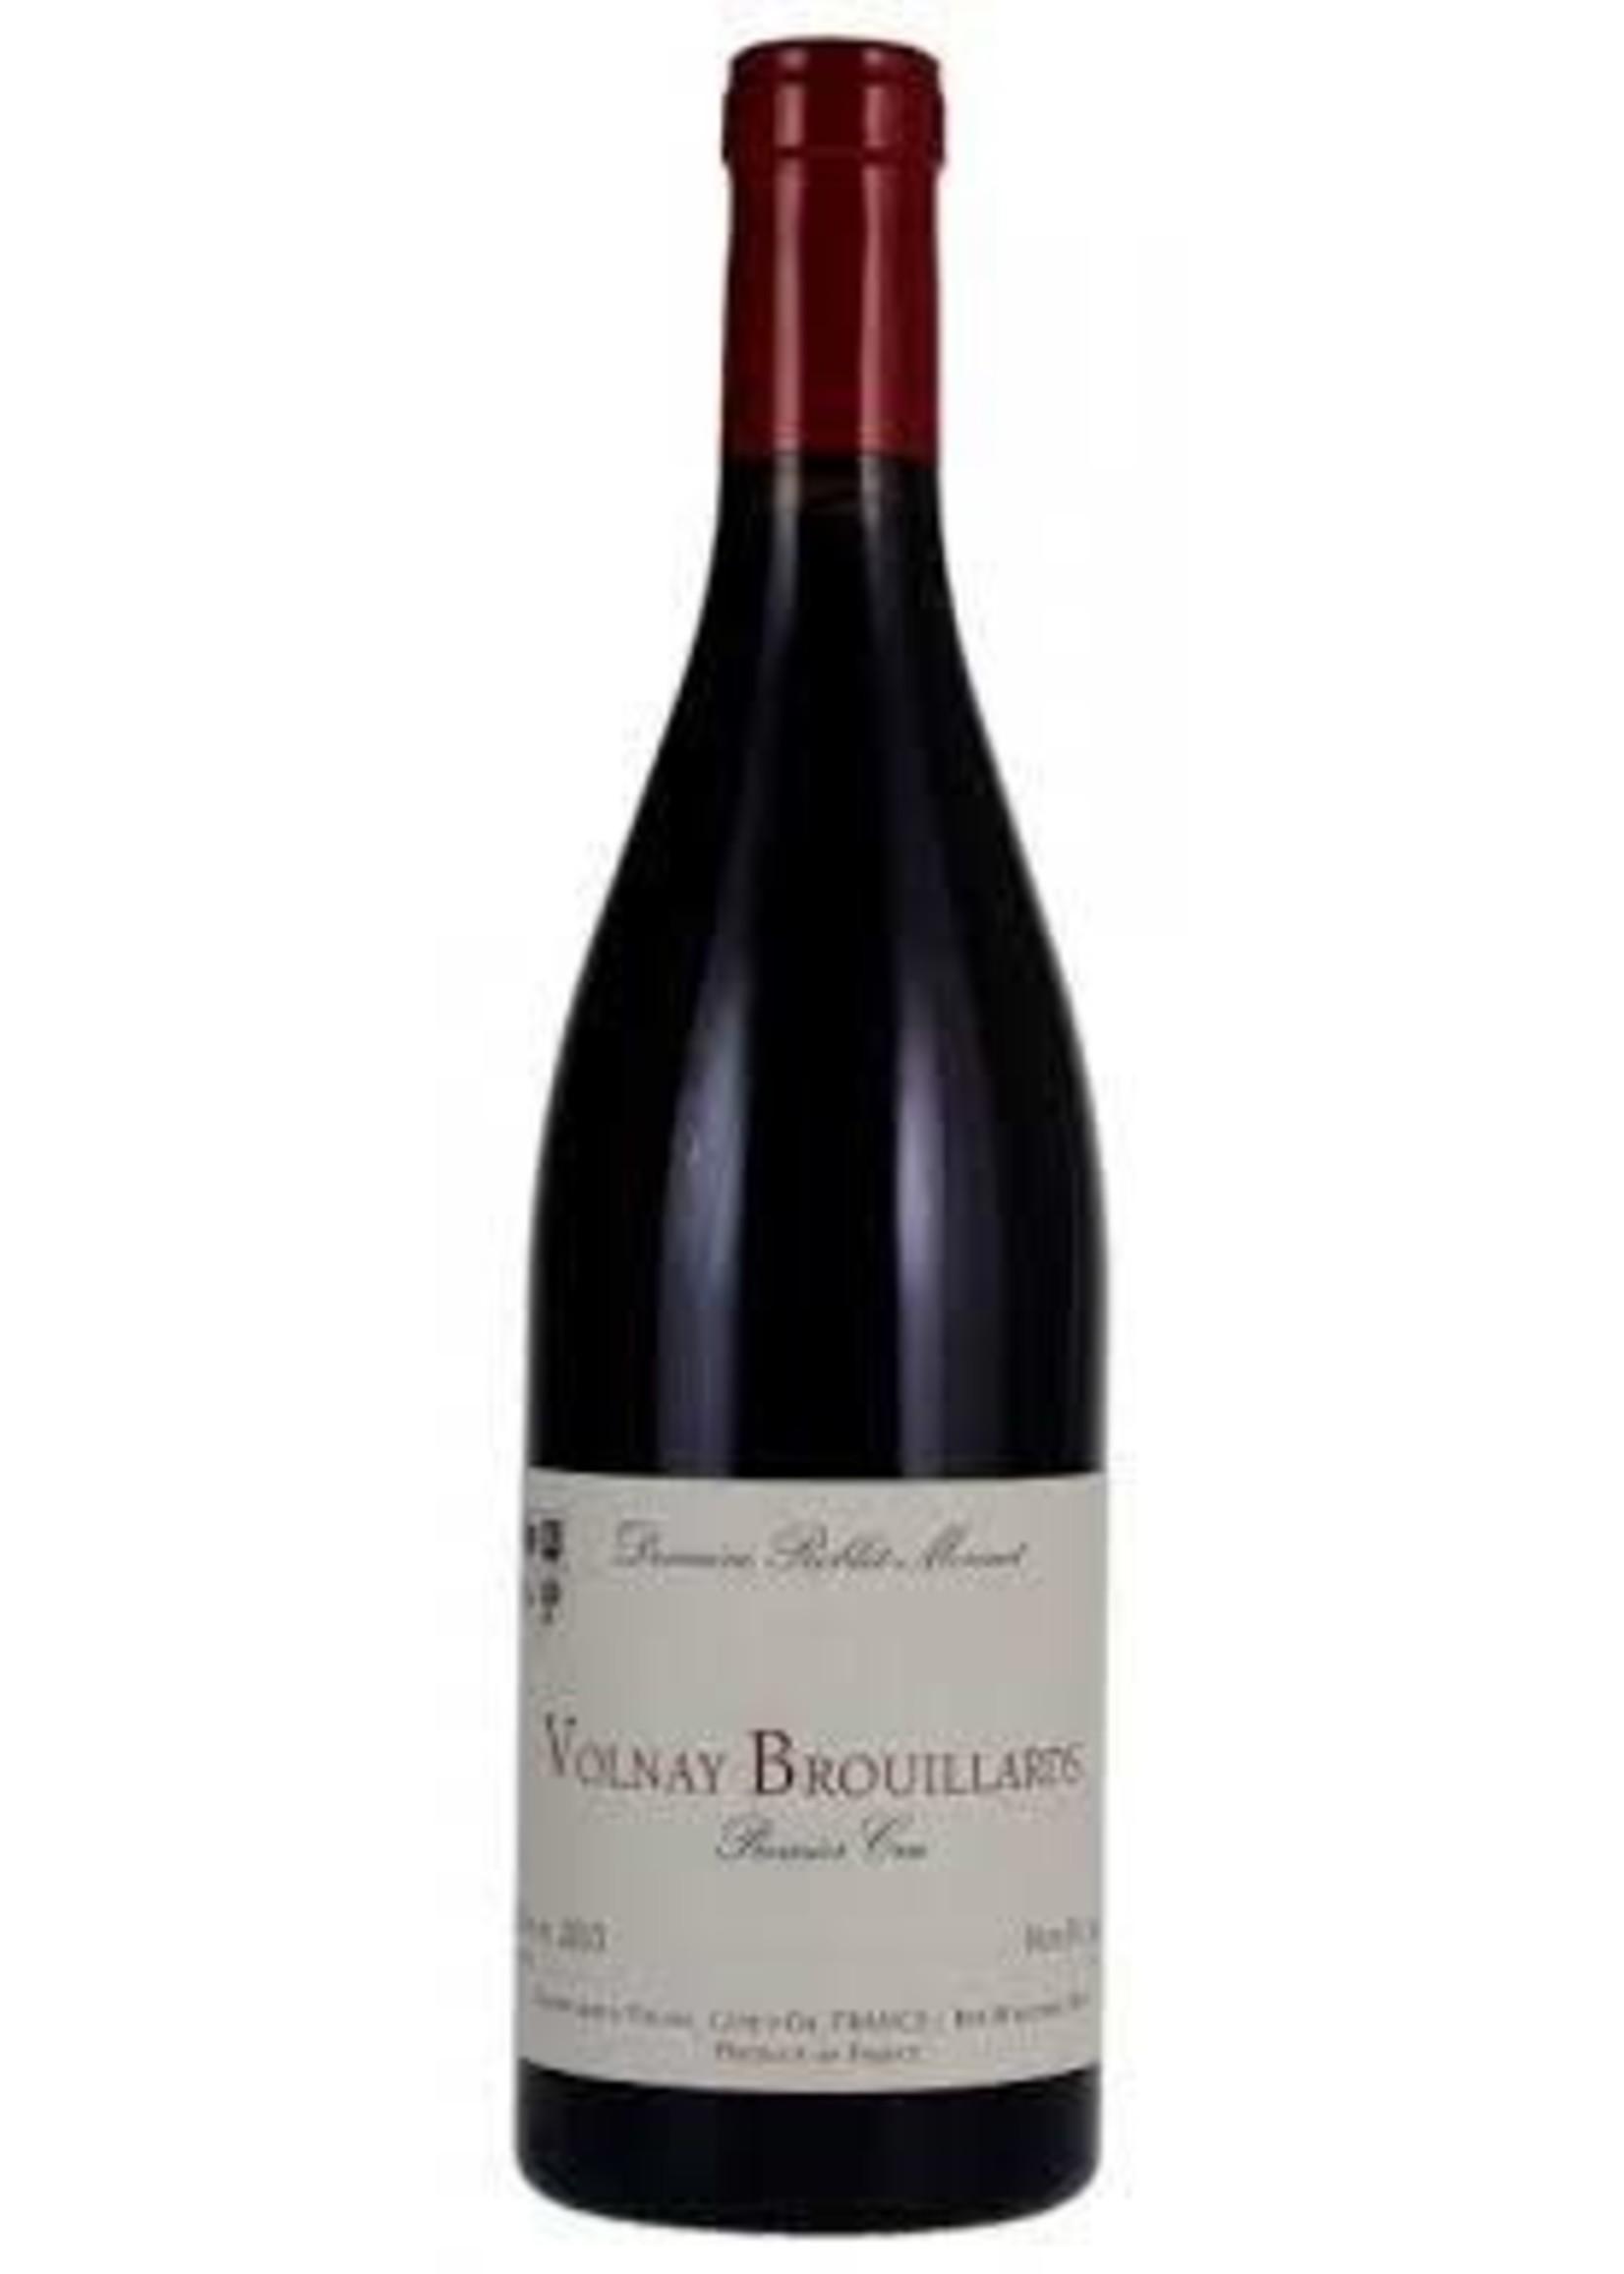 Roblet Monnot 2017 Volnay 1er Cru Les Brouillards 750ml